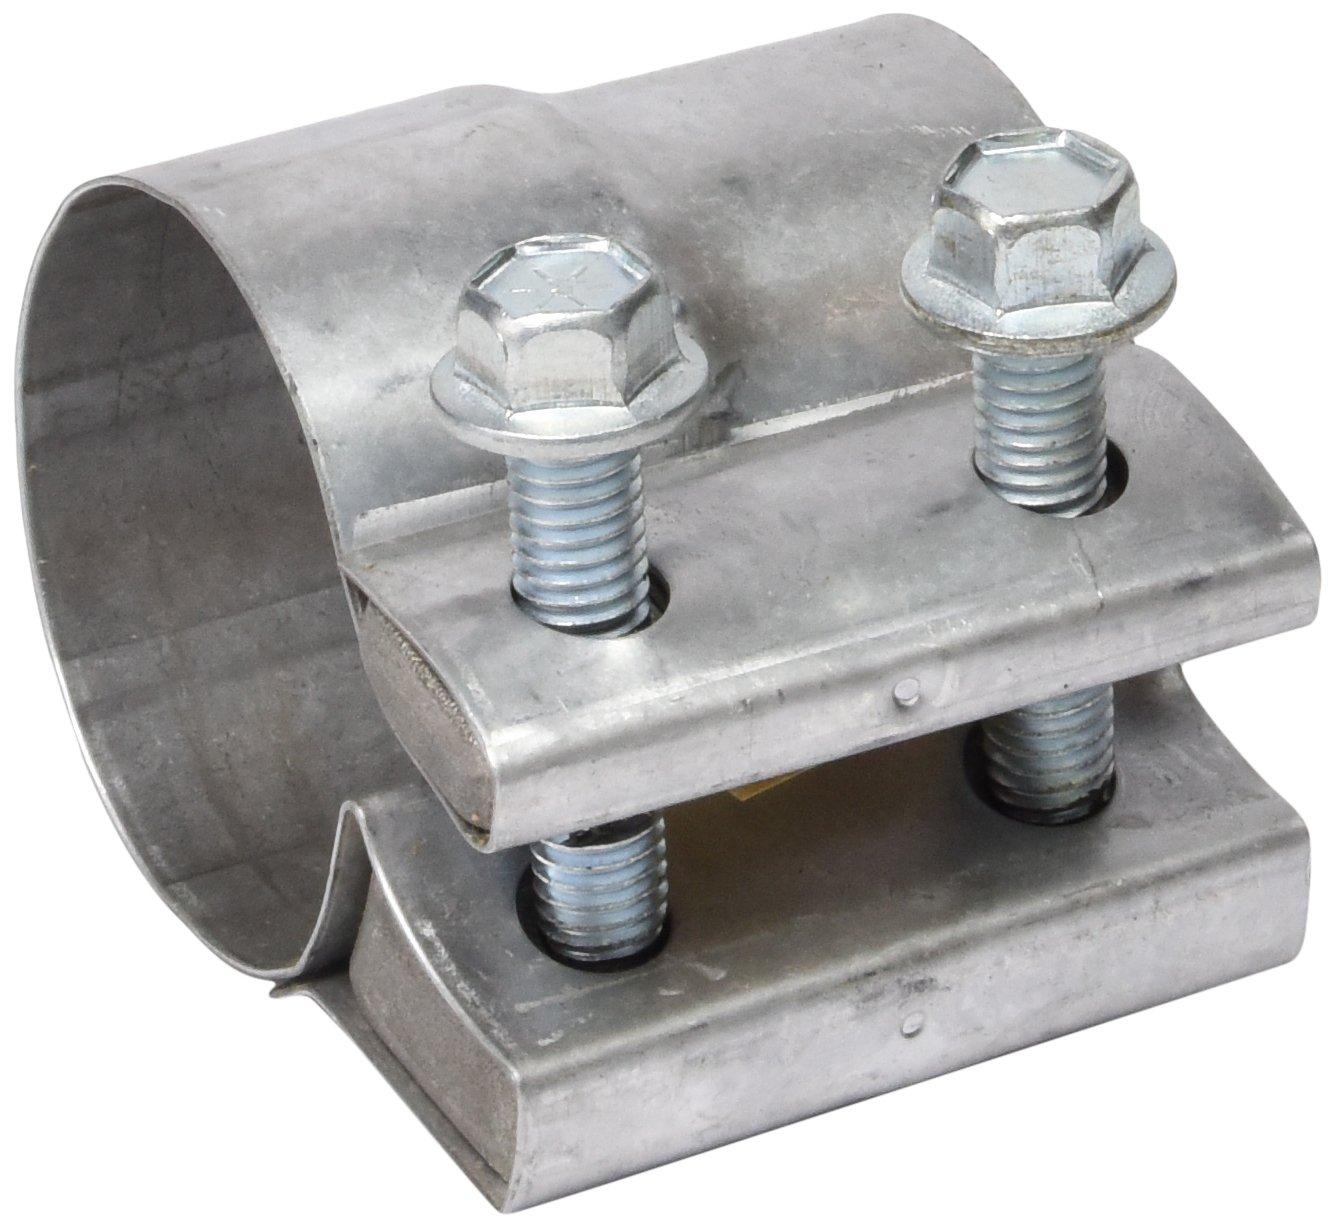 Walker (33975) 2-1/4'' Aluminized Lap-Joint Exhaust Clamp